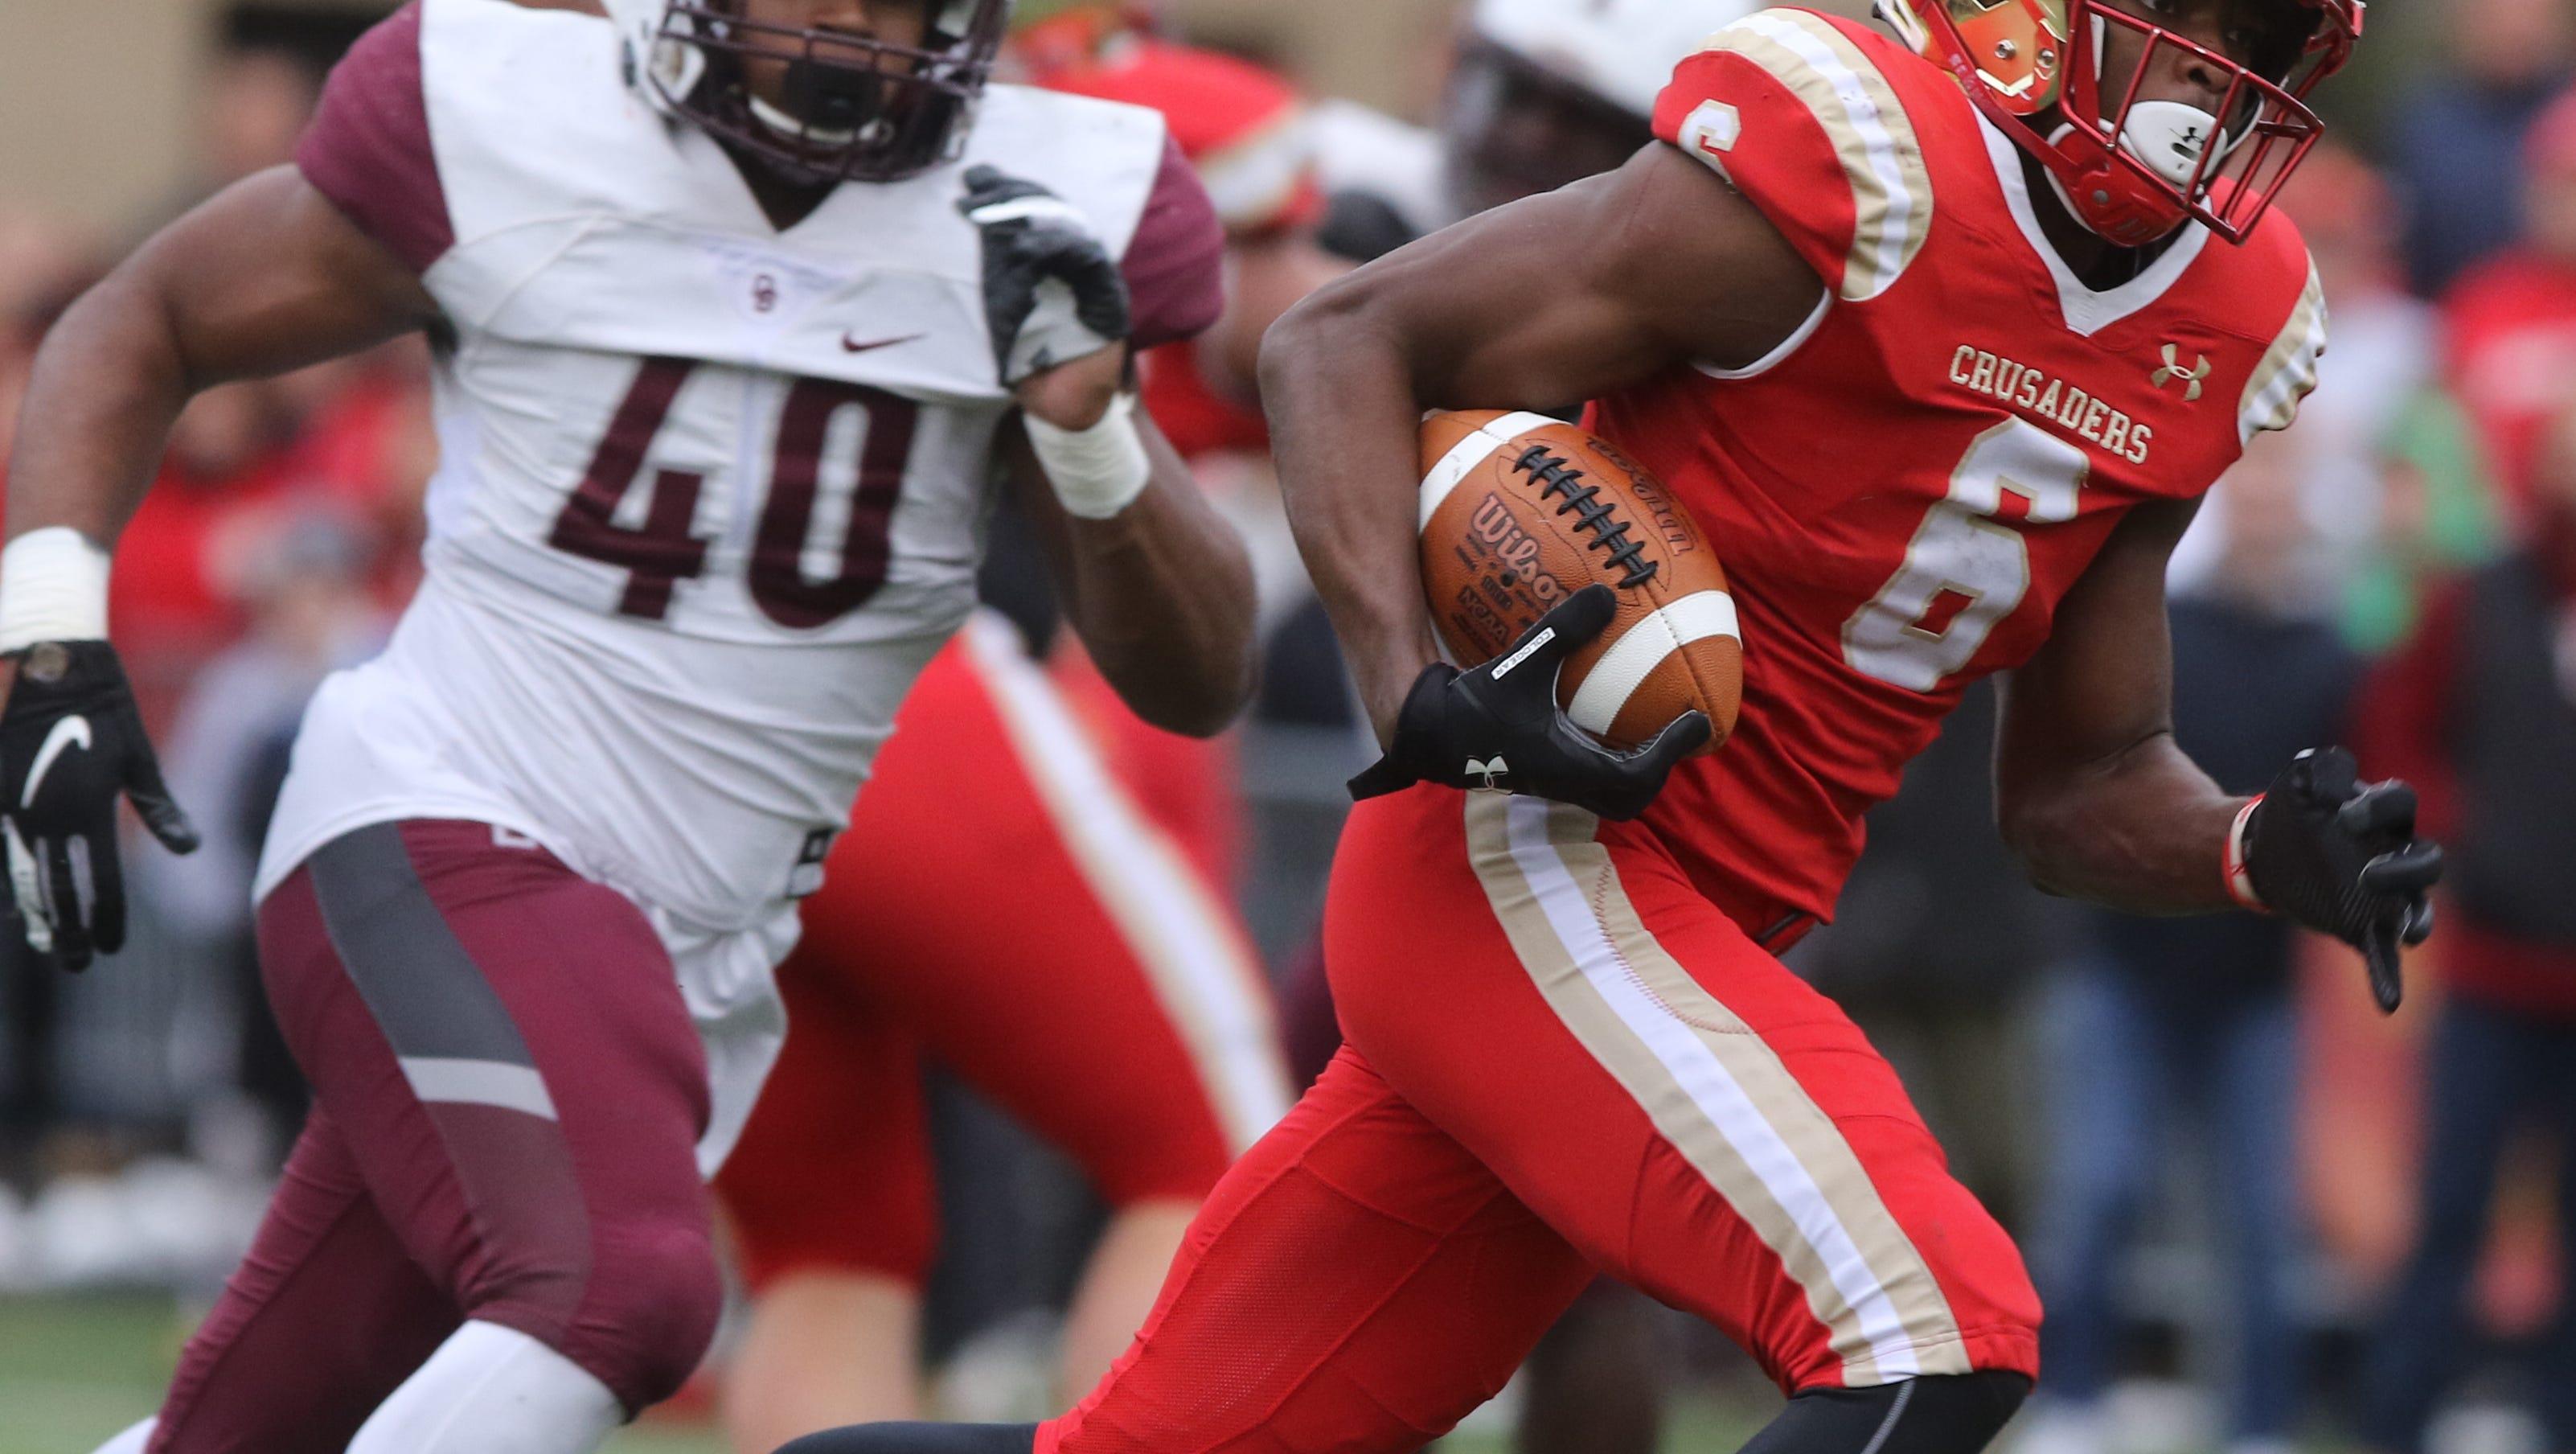 Rahmir Johnson of Bergen Catholic runs for a second half touchdown on this play.